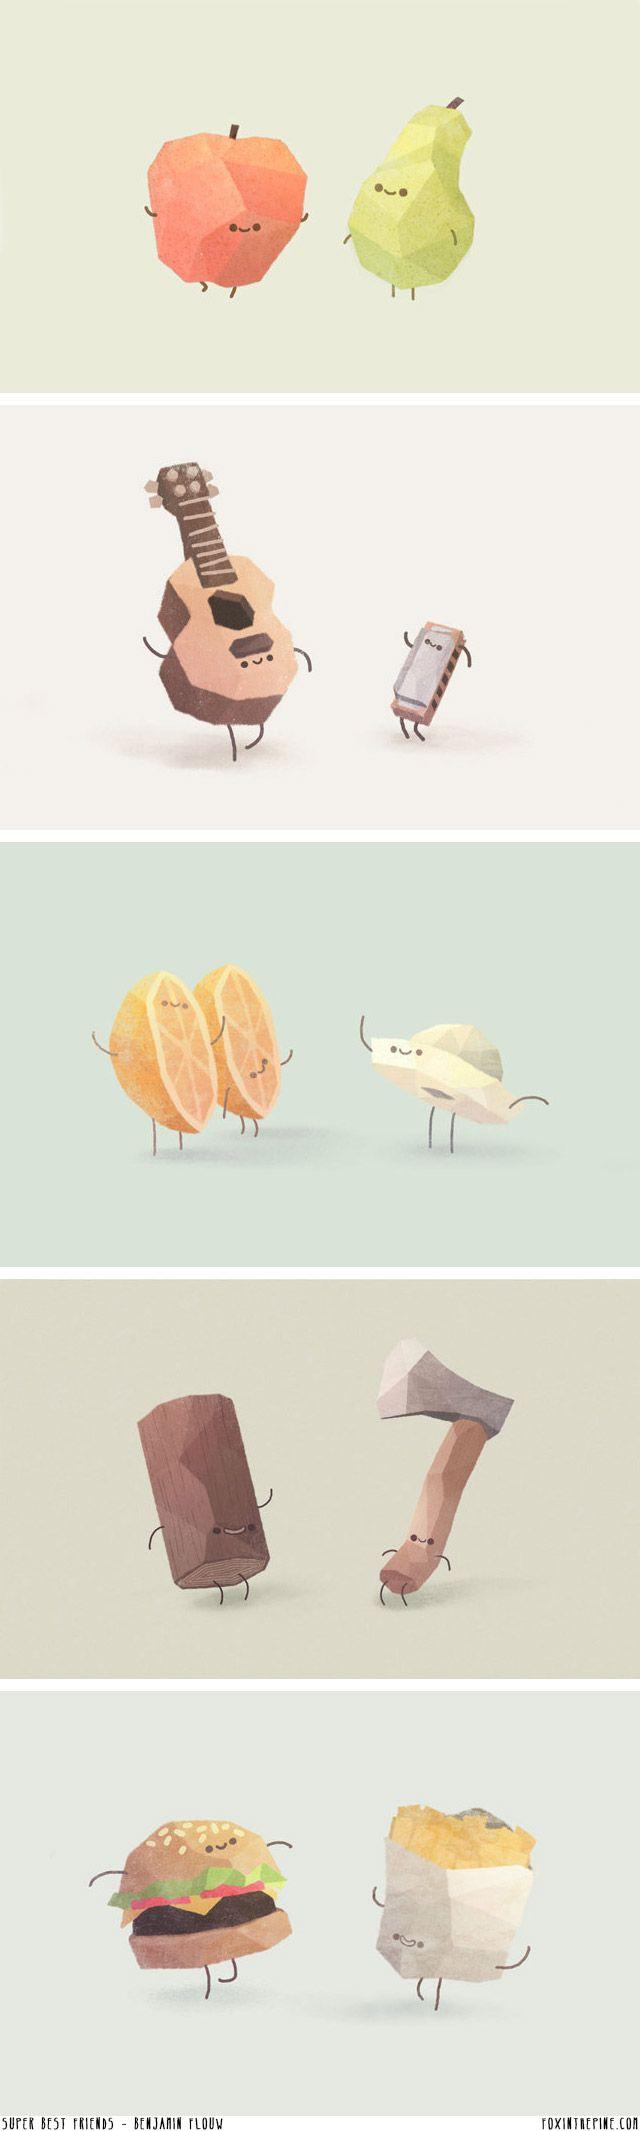 Super Best Friends' prints by Benjamin Flouw   //   FOXINTHEPINE.COM